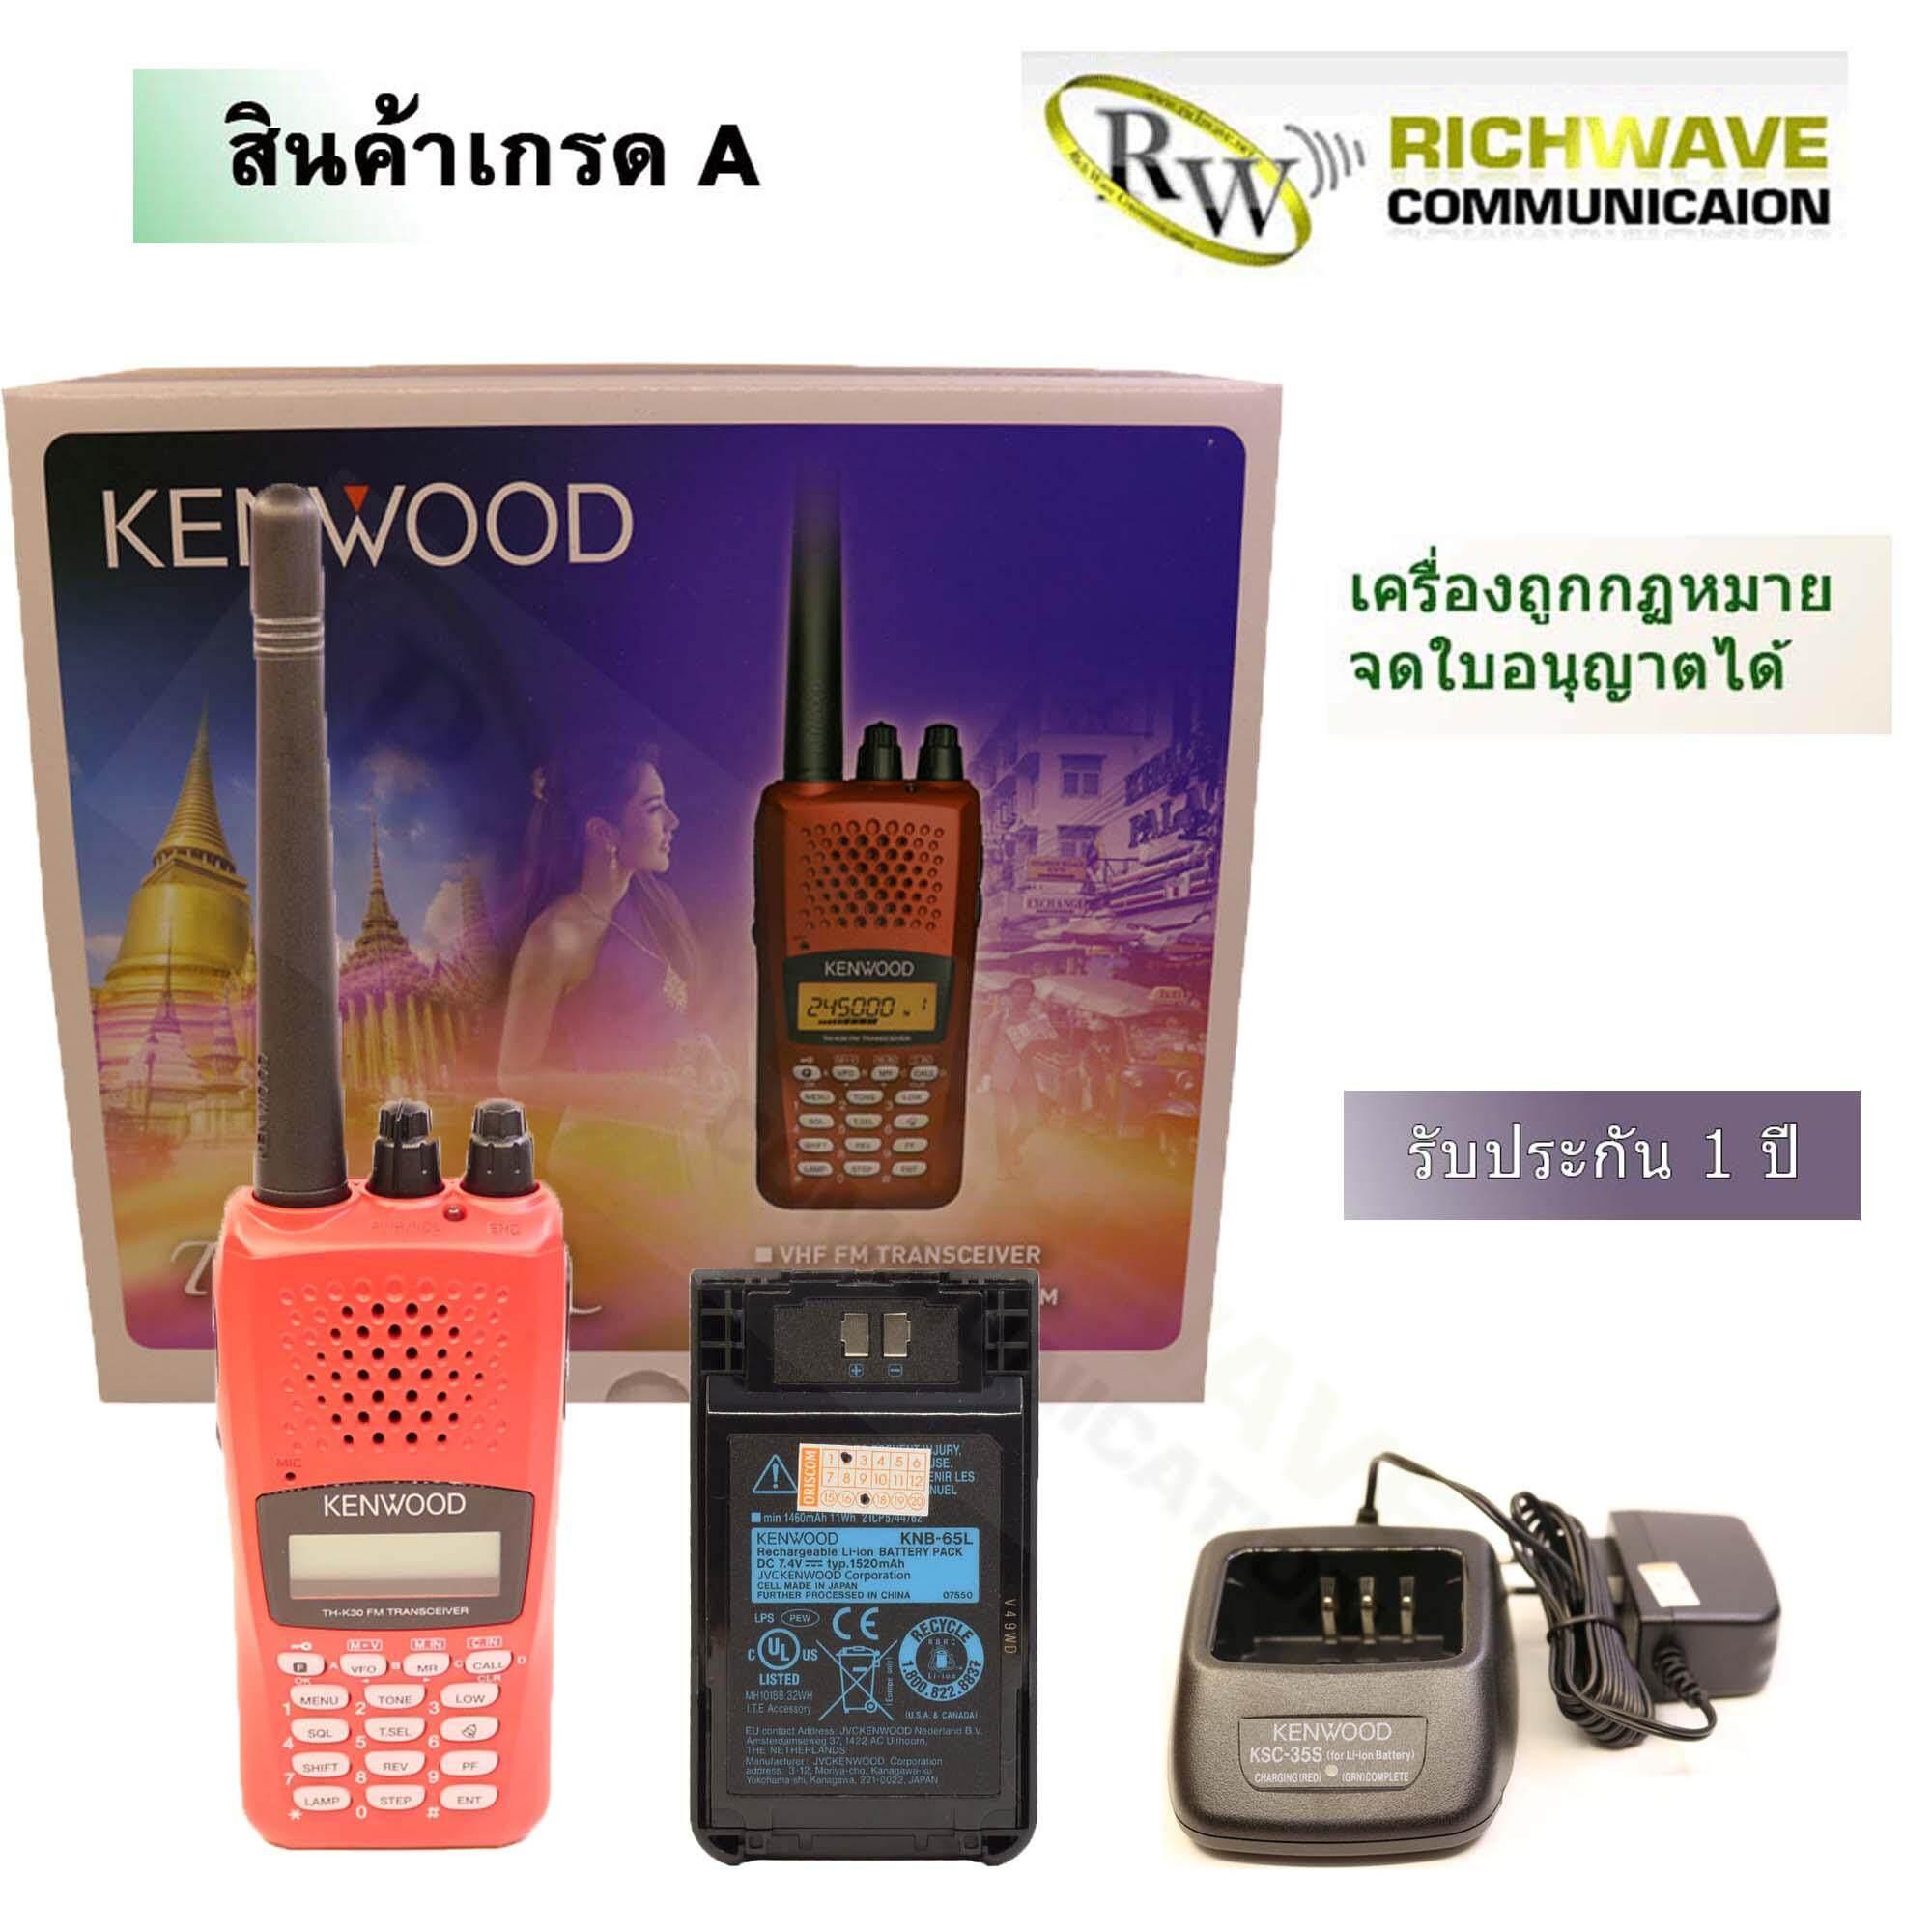 Kenwood วิทยุสื่อสาร TH-K30R เครื่อง ถูกกฎหมาย 5 วัตต์ เกรด A สีแดง